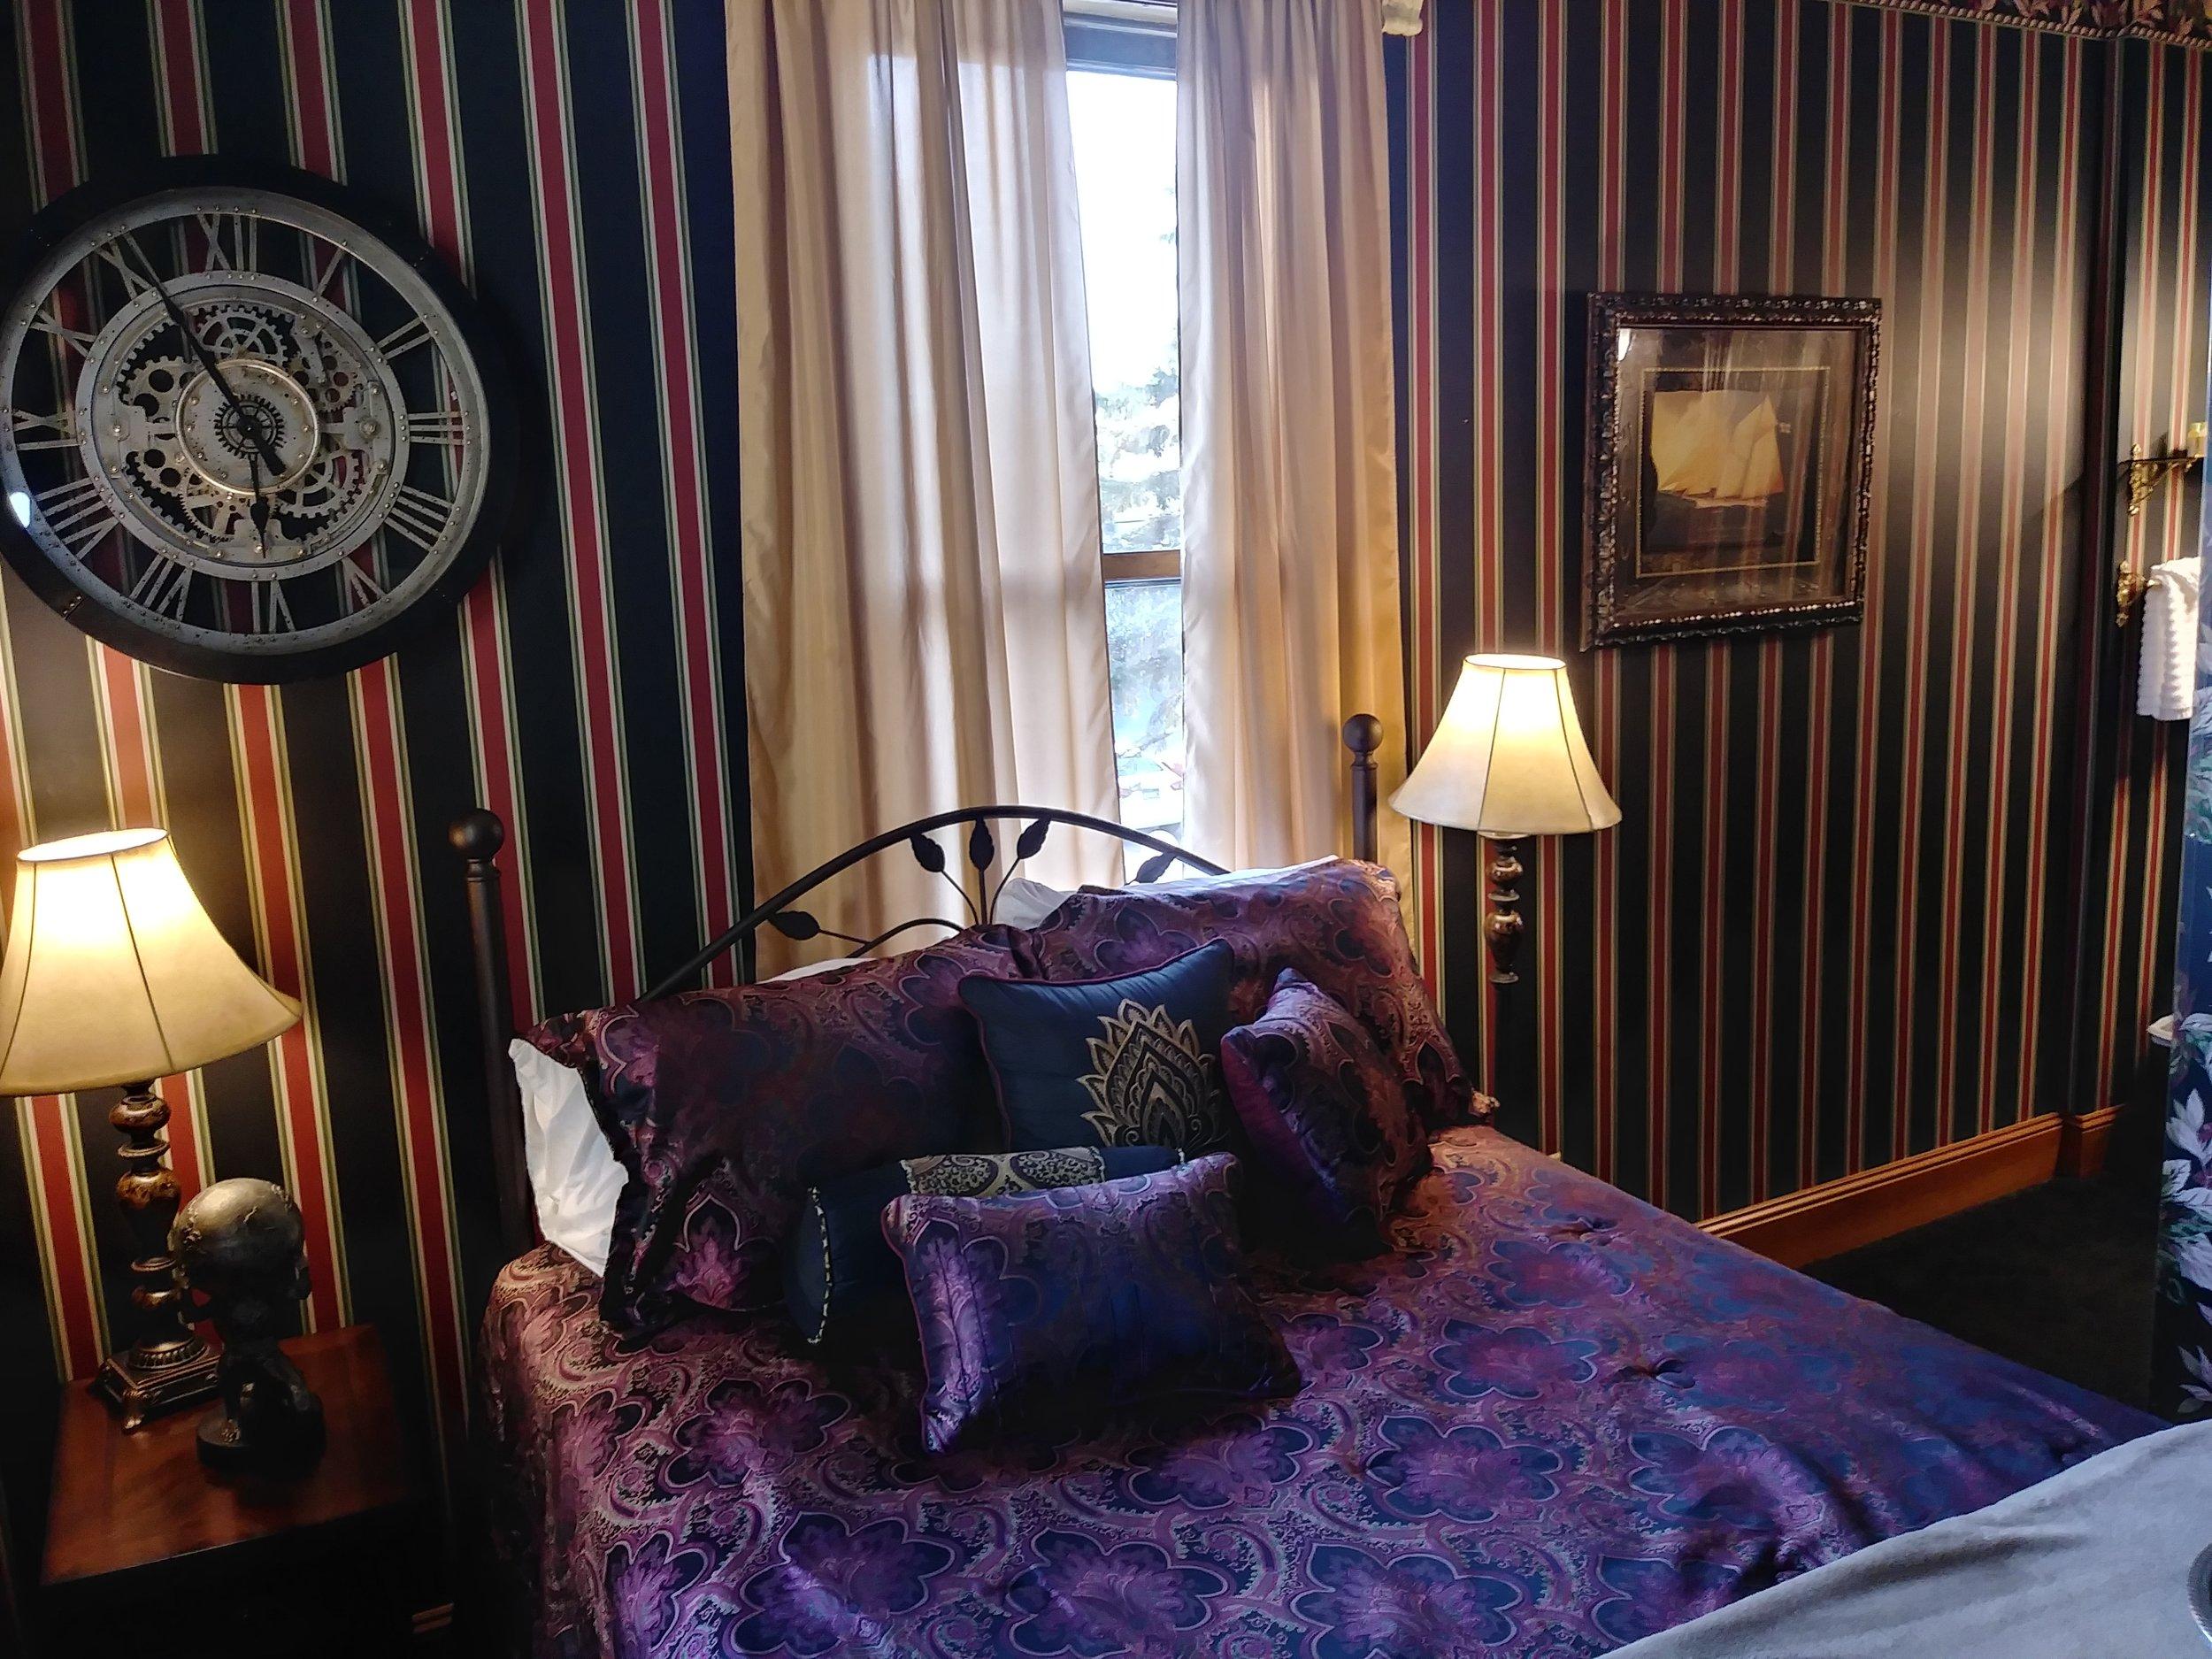 Room 207 09.jpg